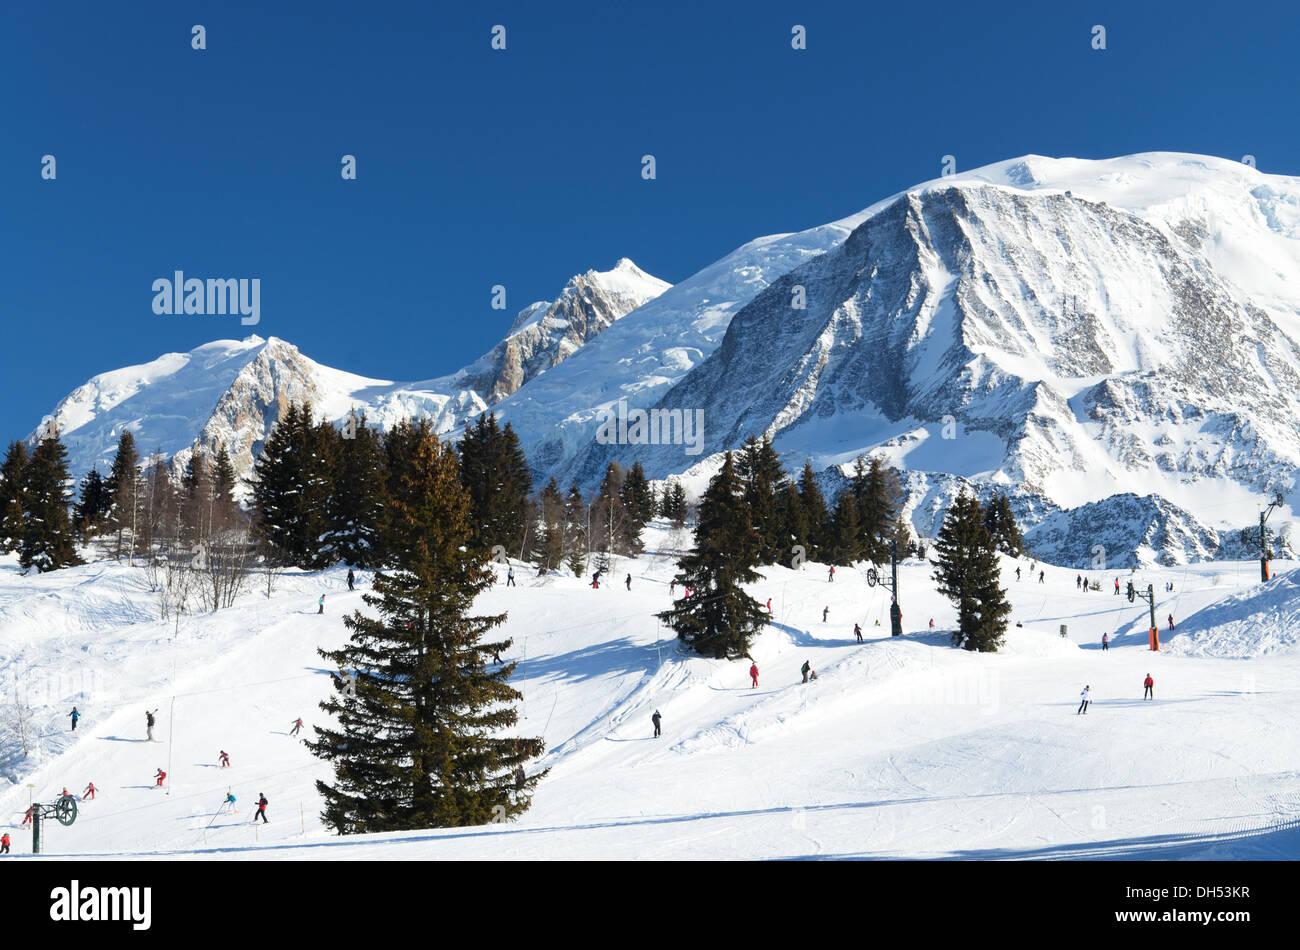 Chamonix ski resort - Stock Image